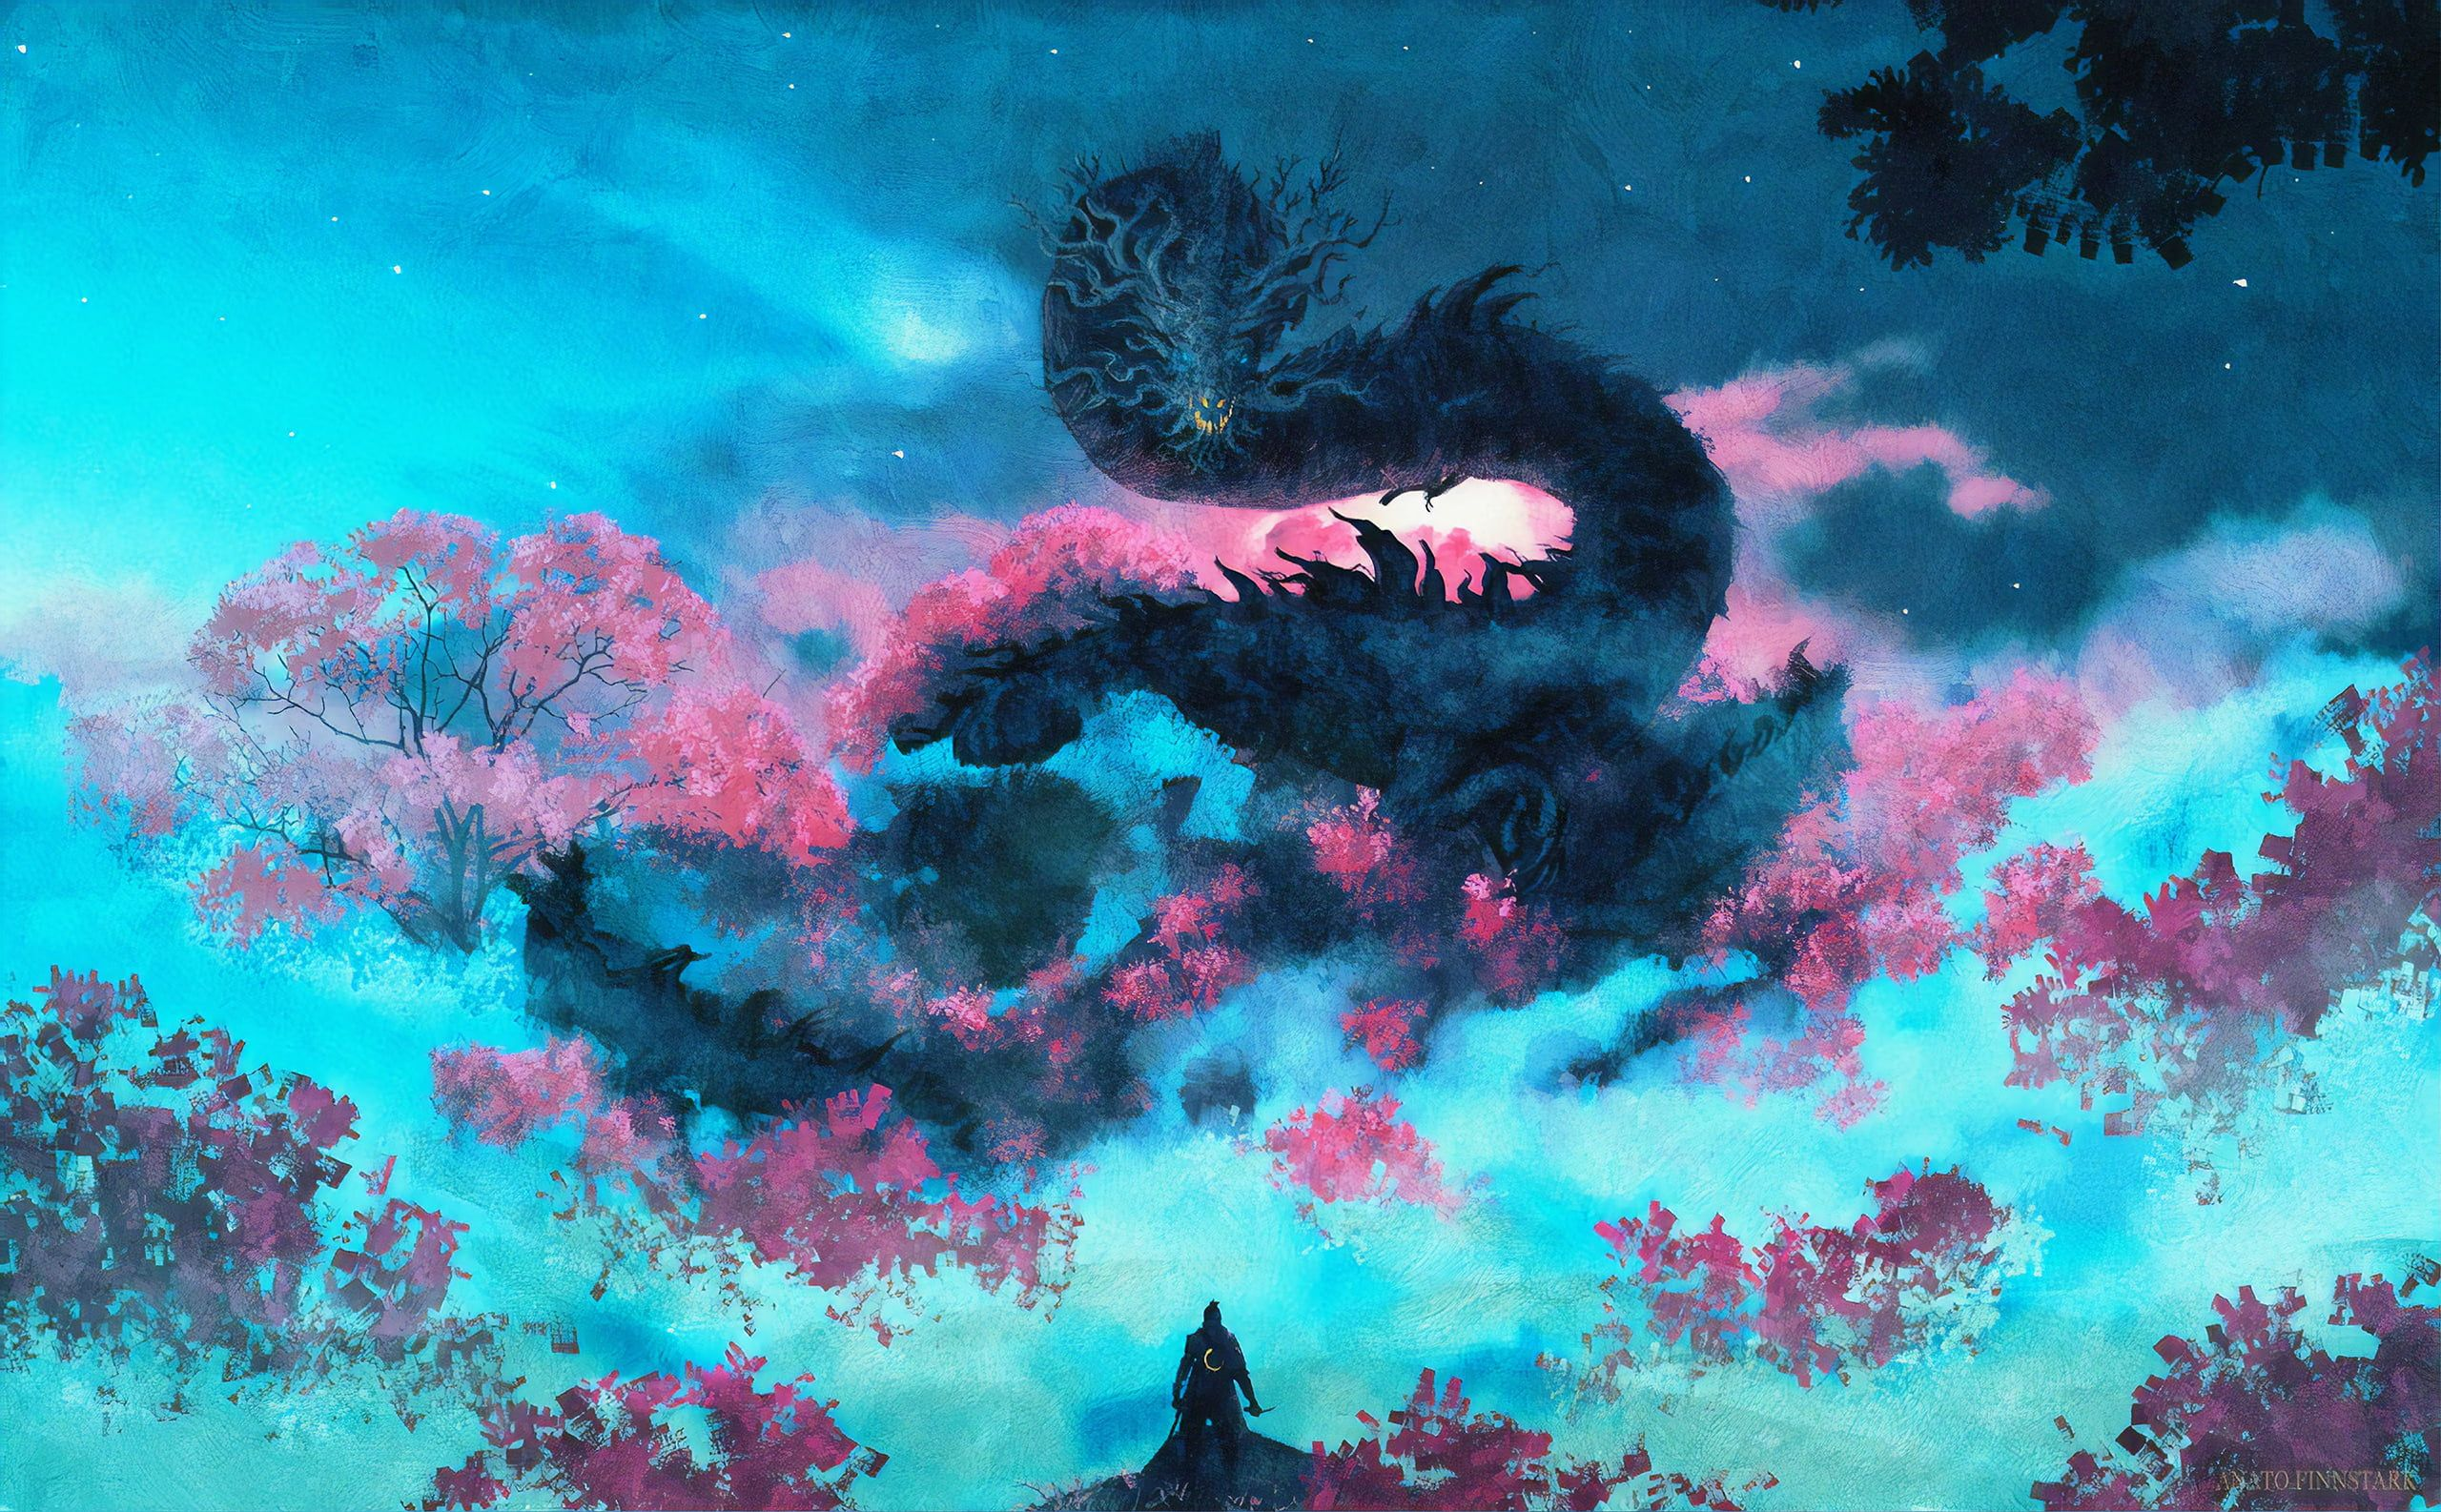 Video Game Sekiro Shadows Die Twice Dragon Warrior 2k Wallpaper Hdwallpaper Desktop Art Digital Artist Artwork